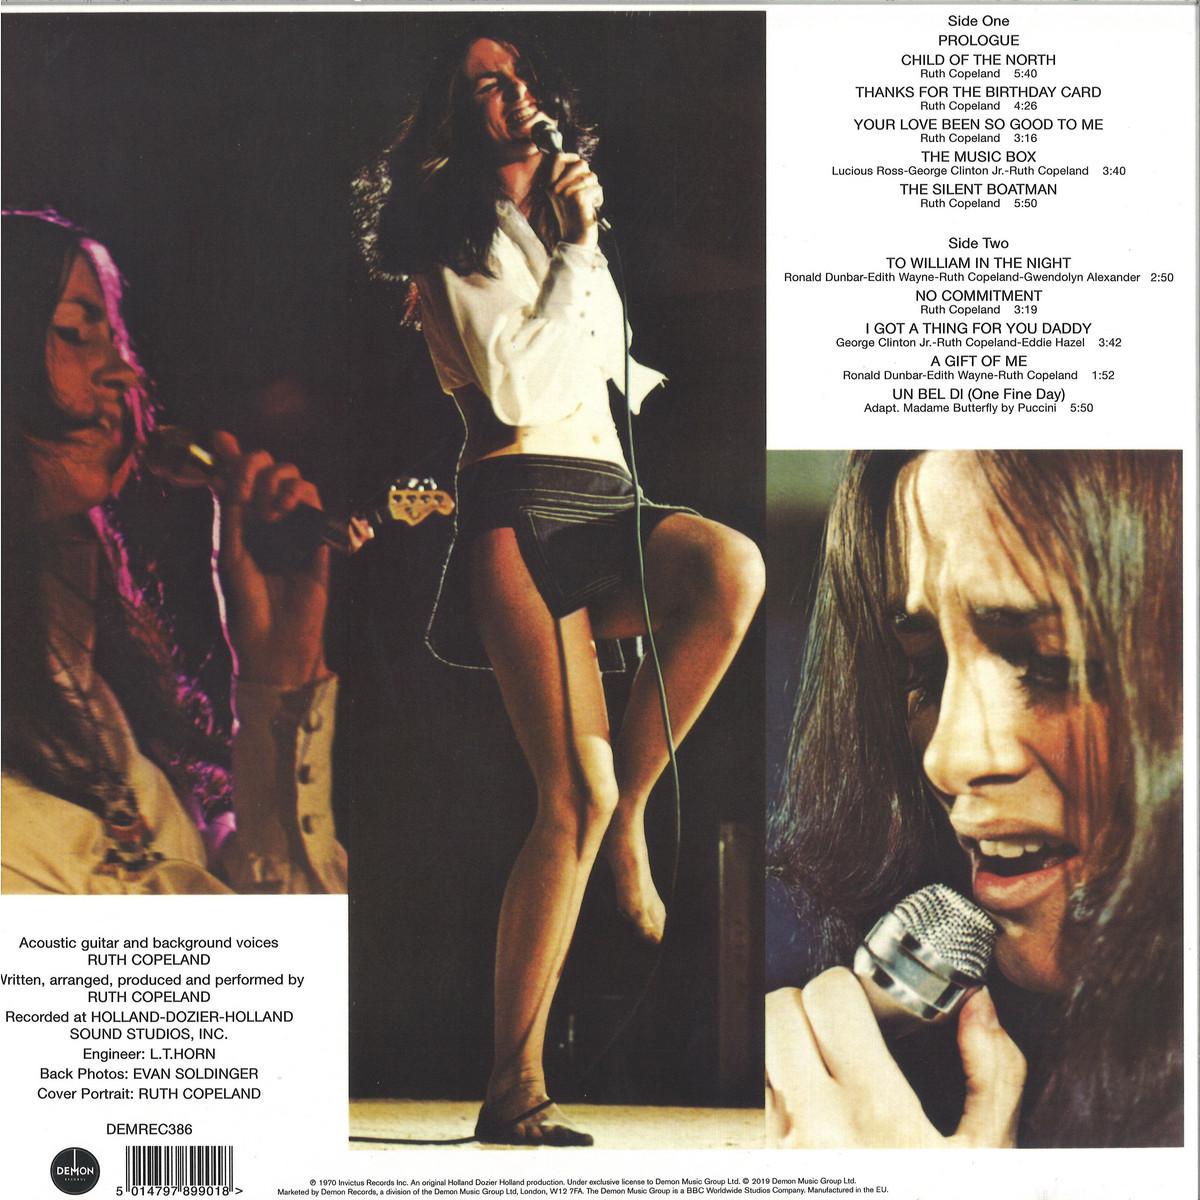 Ruth Copeland - Self Portrait / Demon Records DEMREC386 - Vinyl